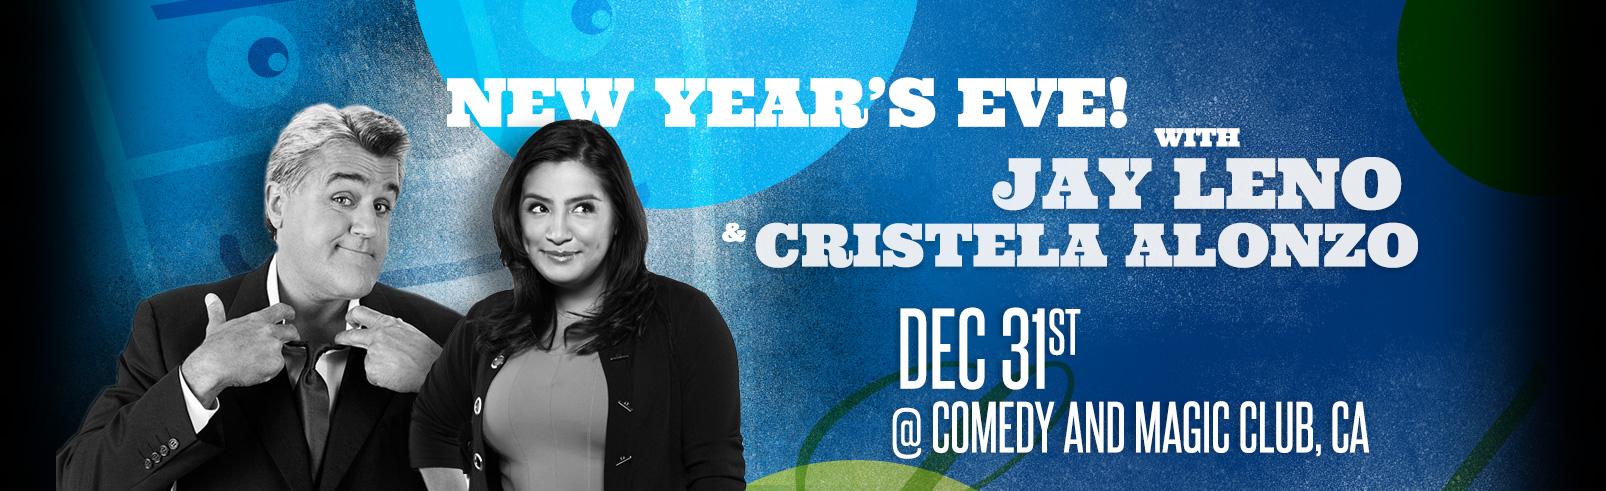 Jay Leno & Cristela Alonzo @ Comedy and Magic Club